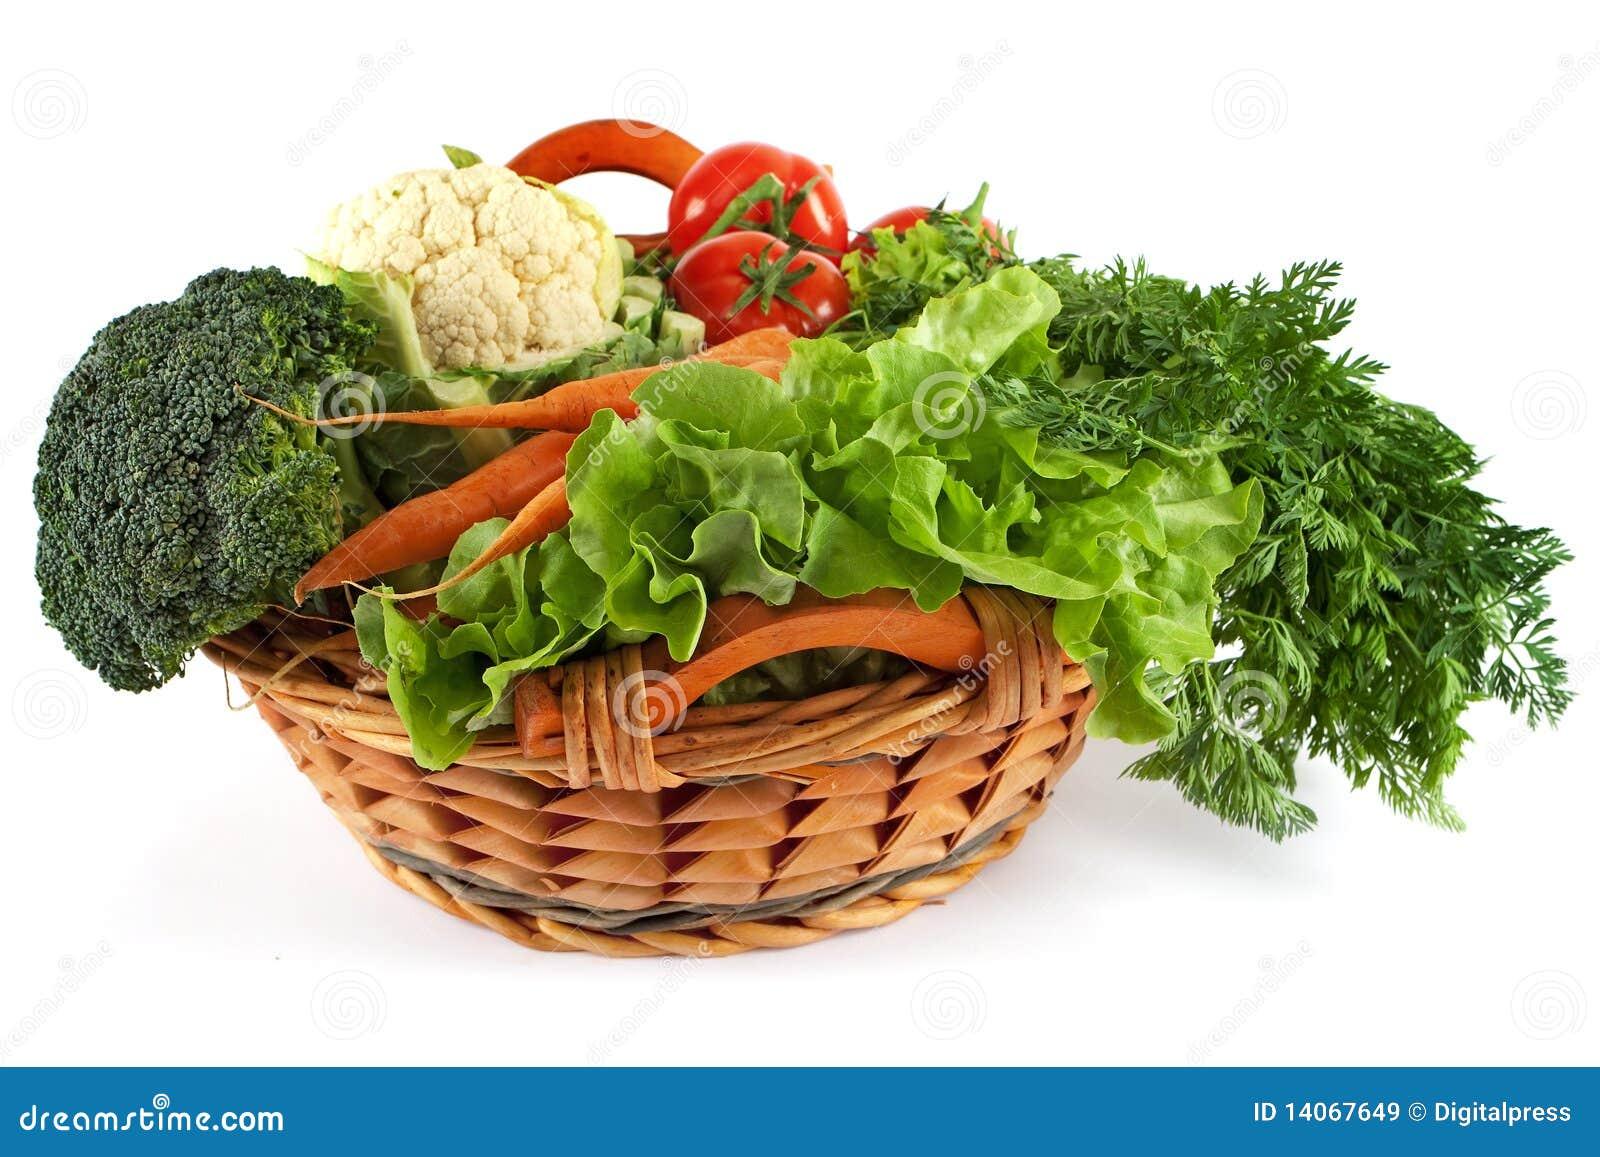 Displaying (20) Gallery Images For Vegetable Basket Clip Art...